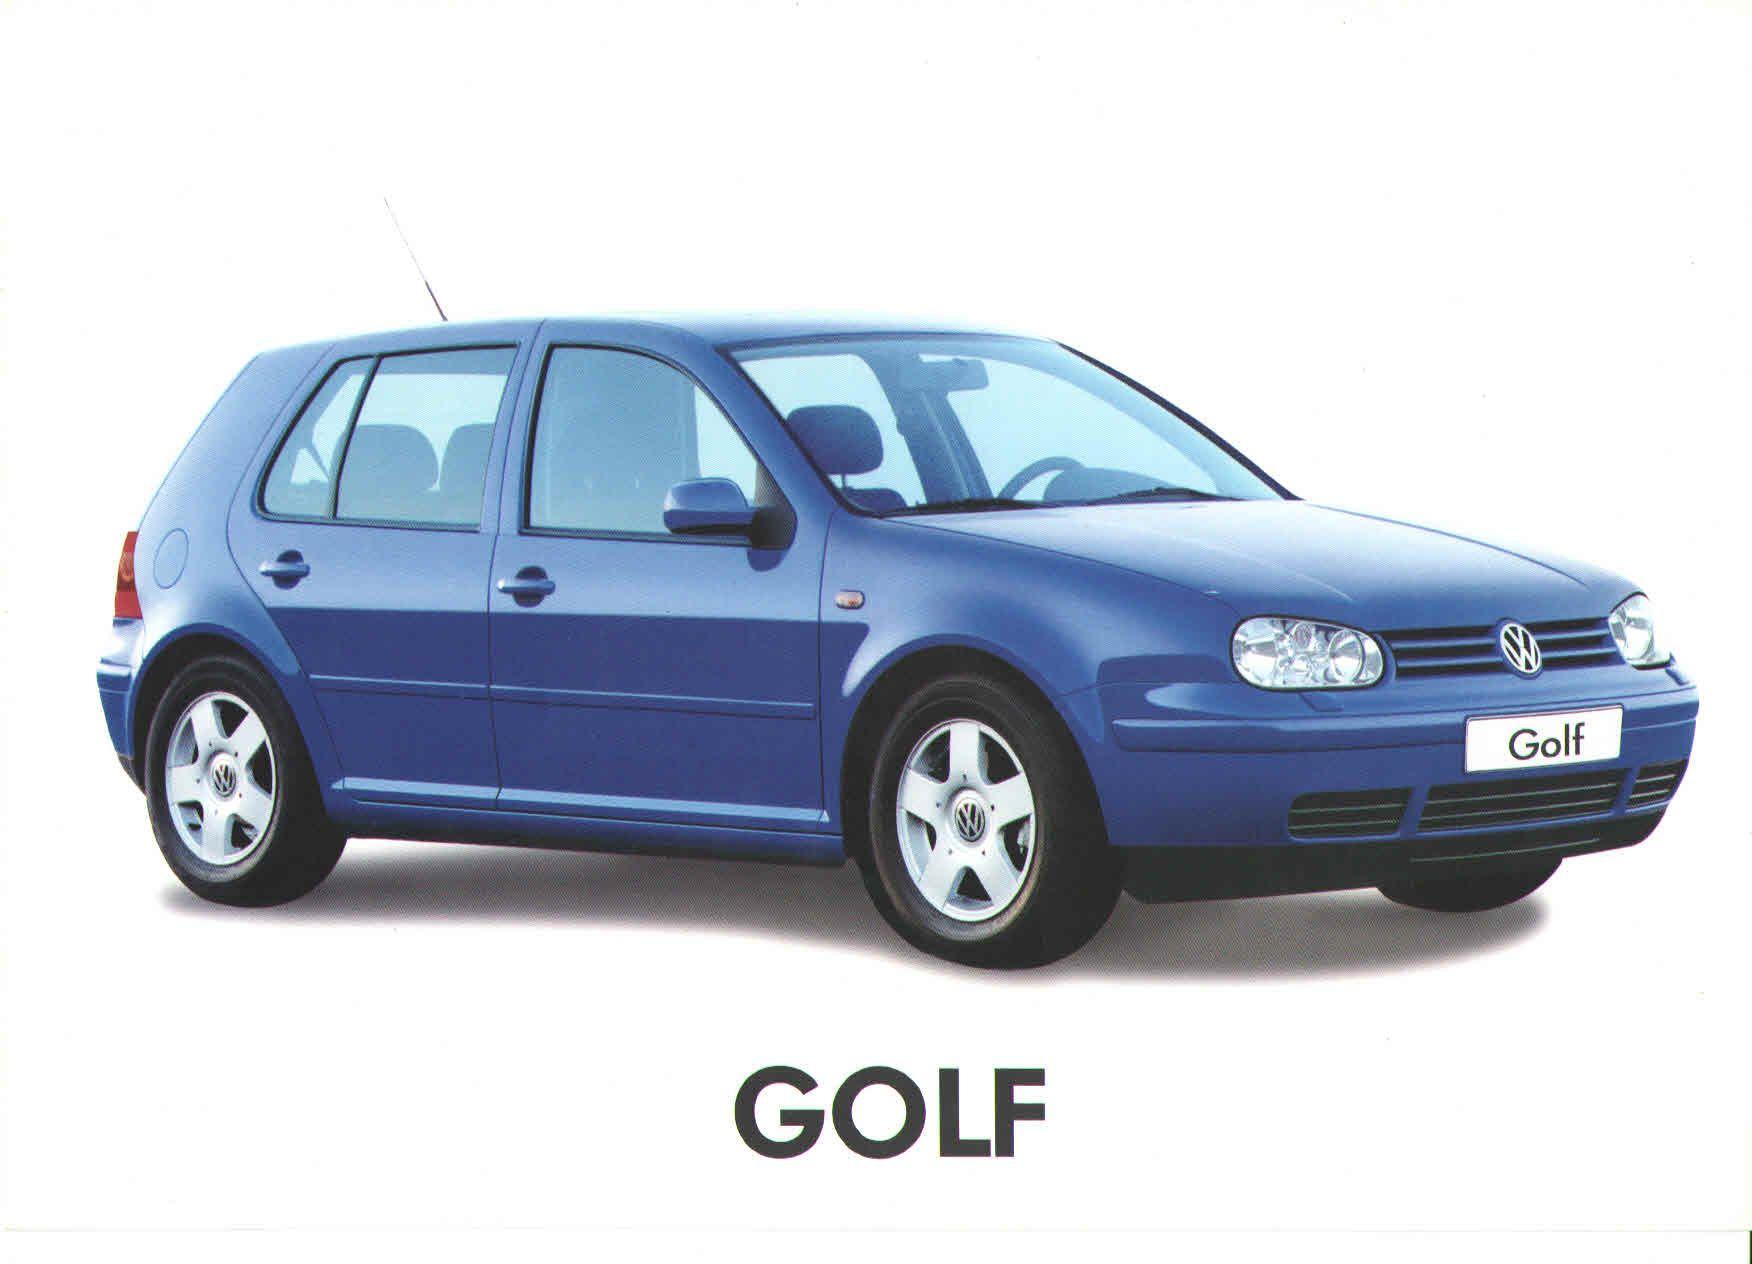 1999 volkswagen golf mk4 turkish brochure catalog page 1 2 1999 volkswagen golf